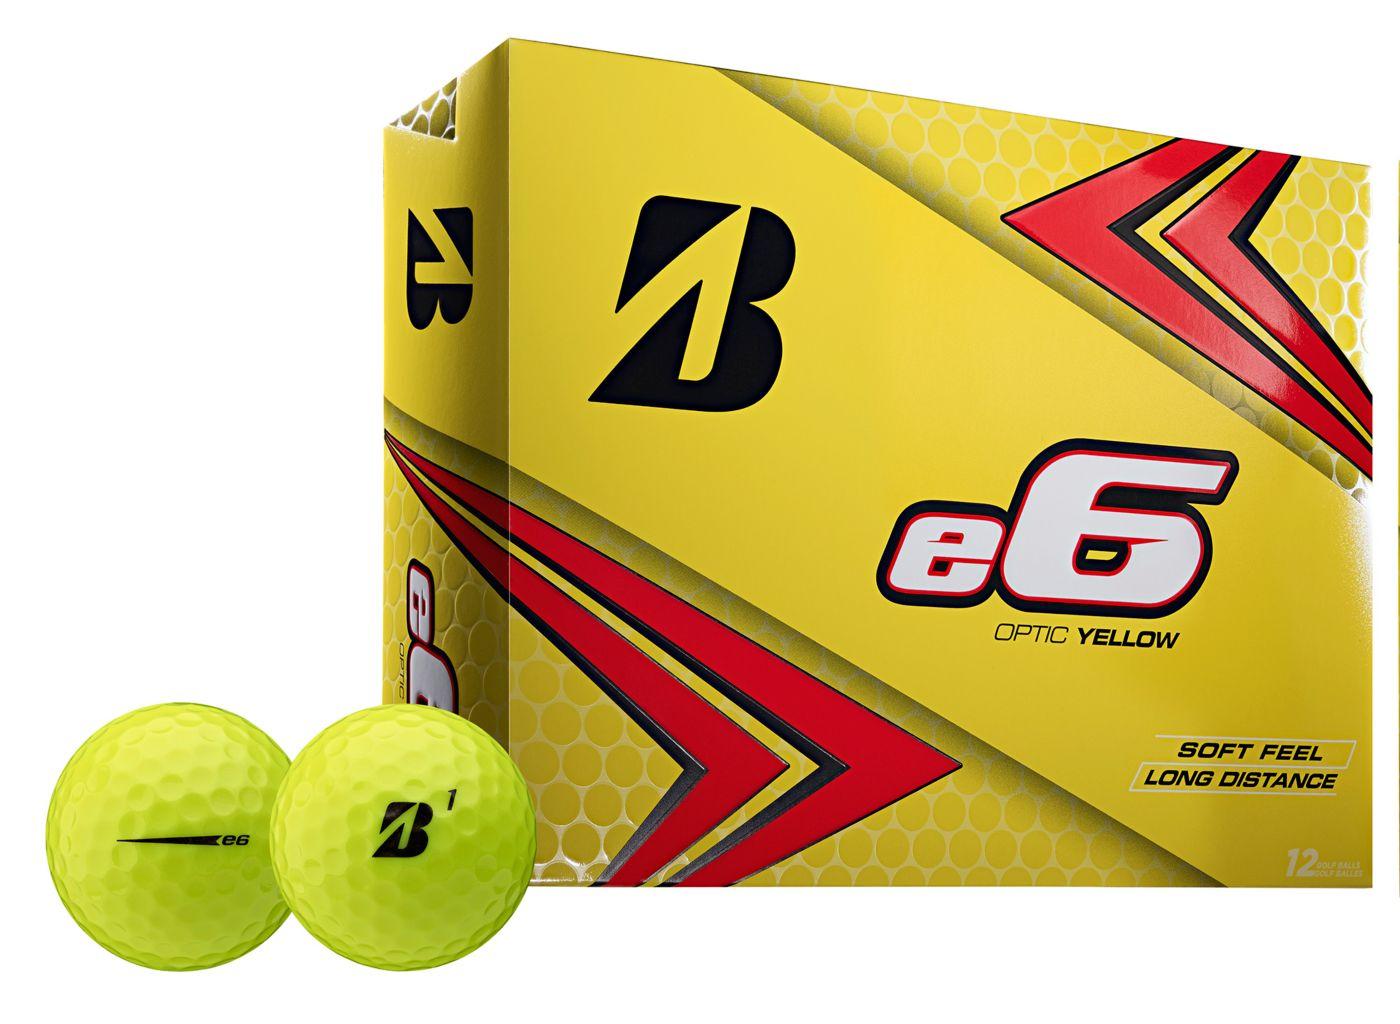 Bridgestone 2019 e6 Optic Yellow Personalized Golf Balls